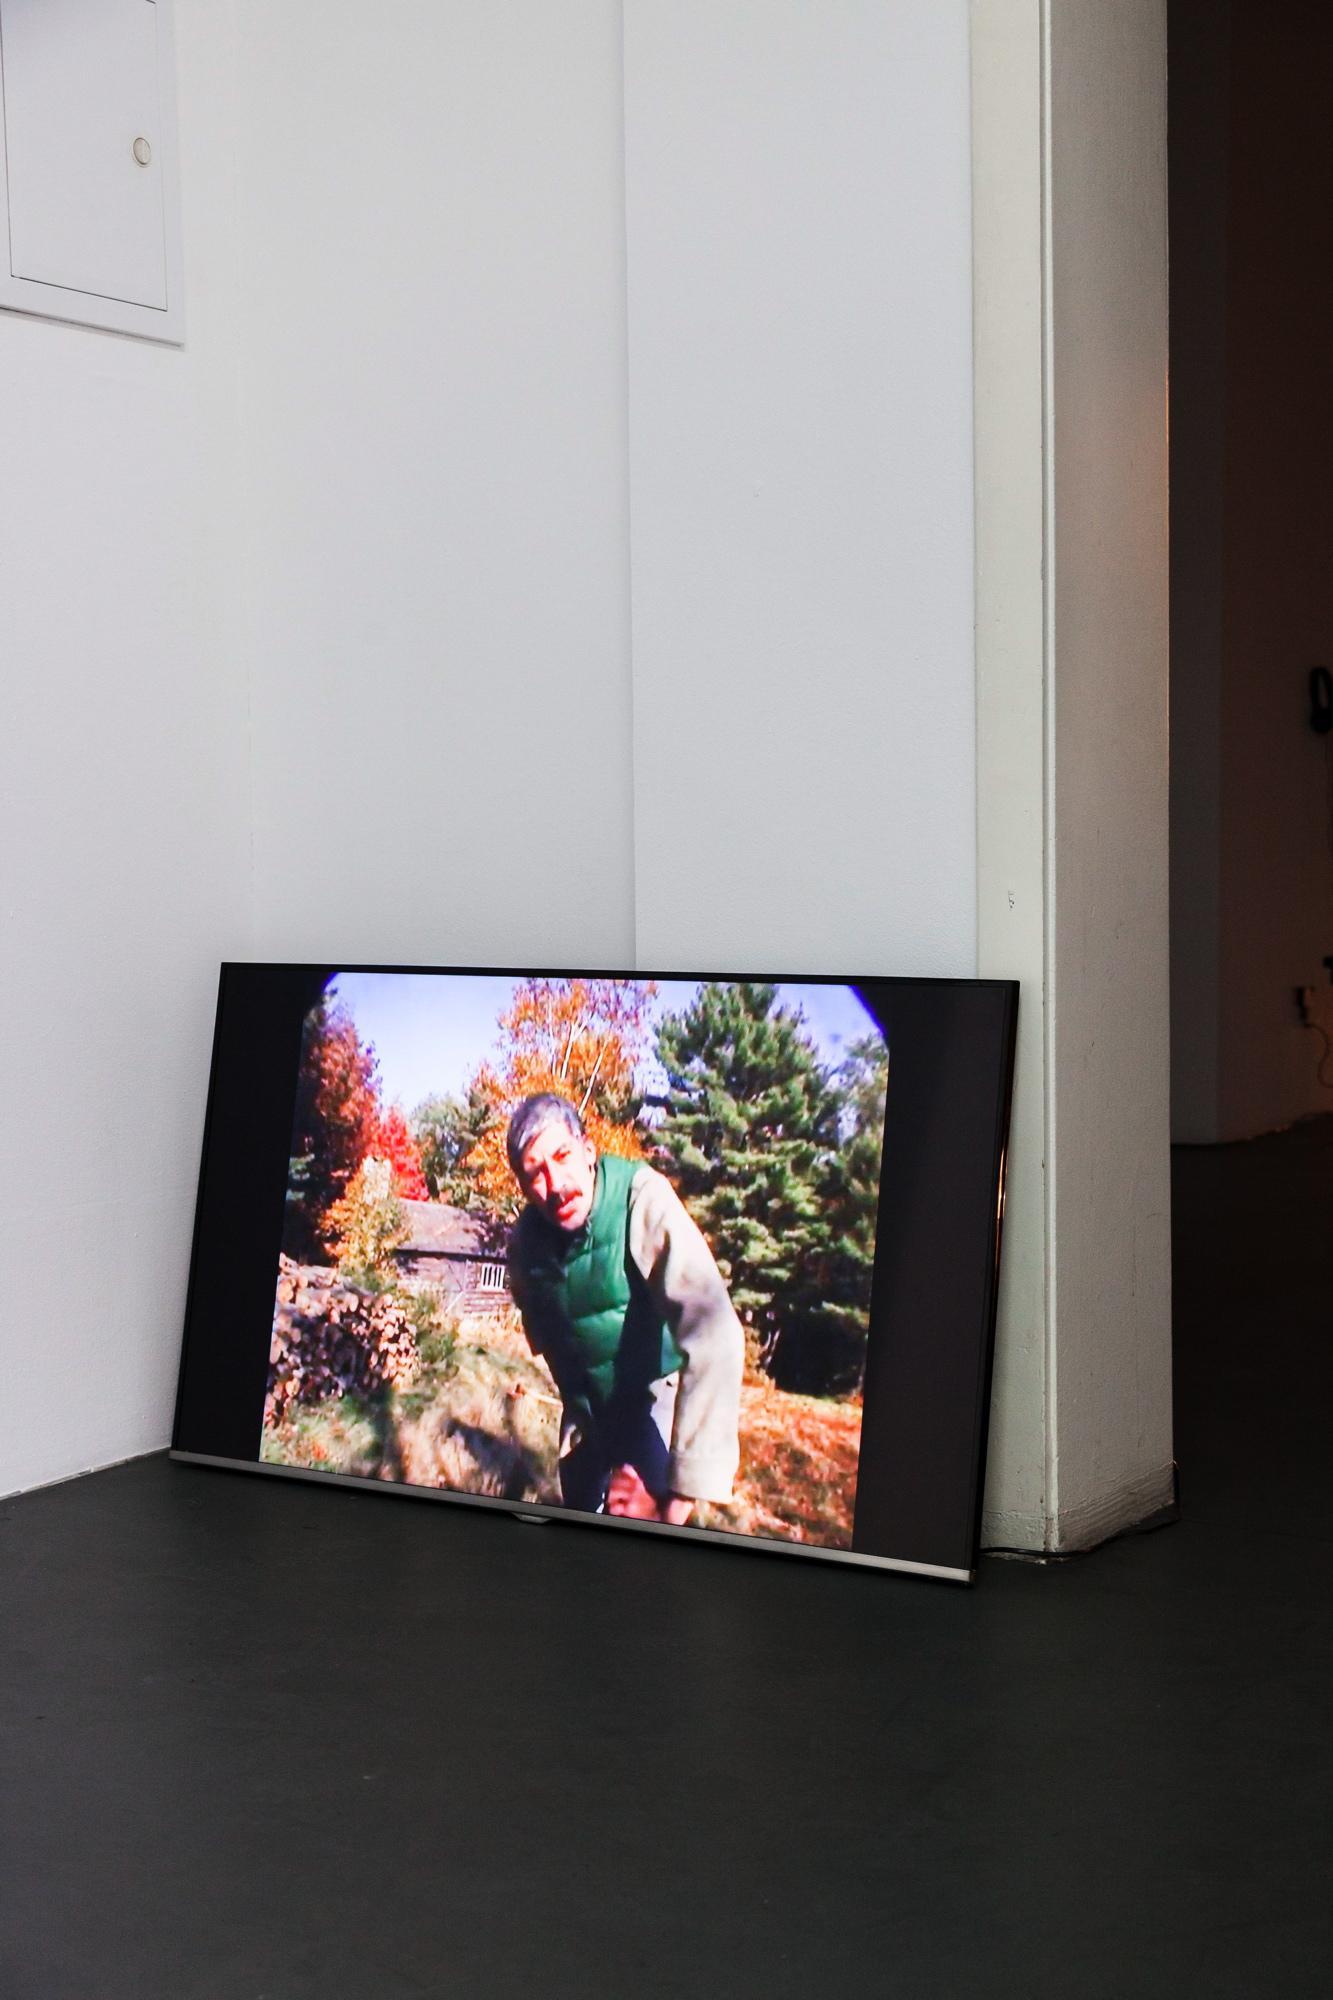 Seth Price. Triumf, 2000,Single channel video, 19.18 min, courtesy of the artist